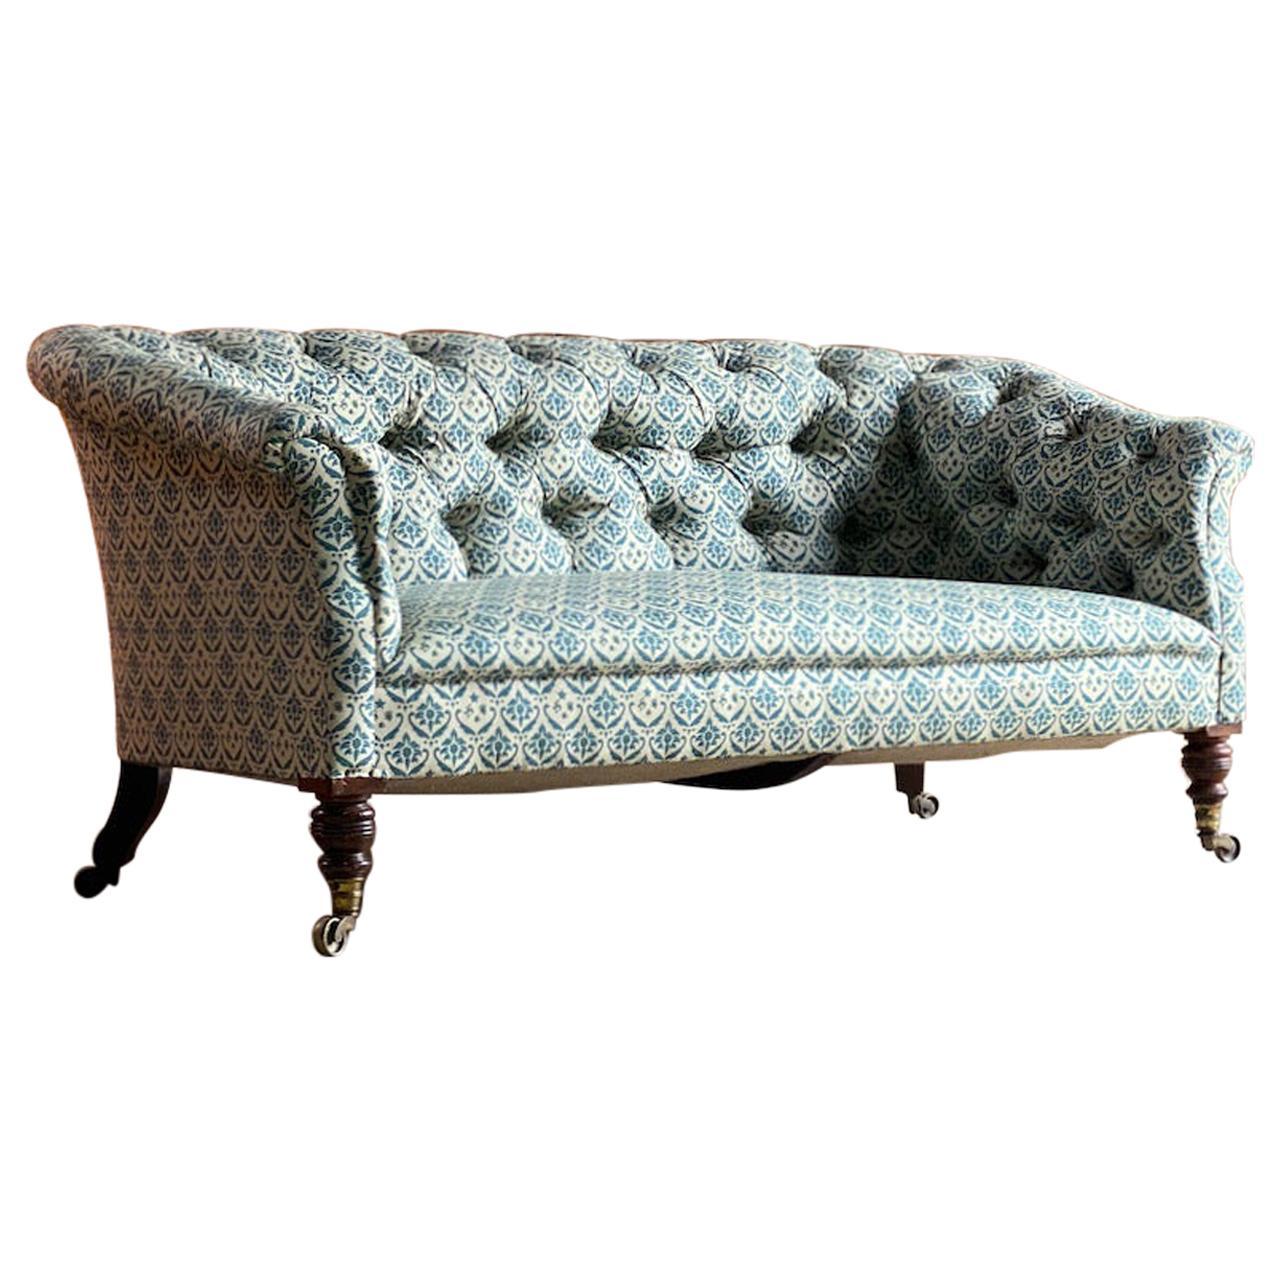 Howard & Sons Chesterfield Sofa 19th Century circa 1850 No: 2